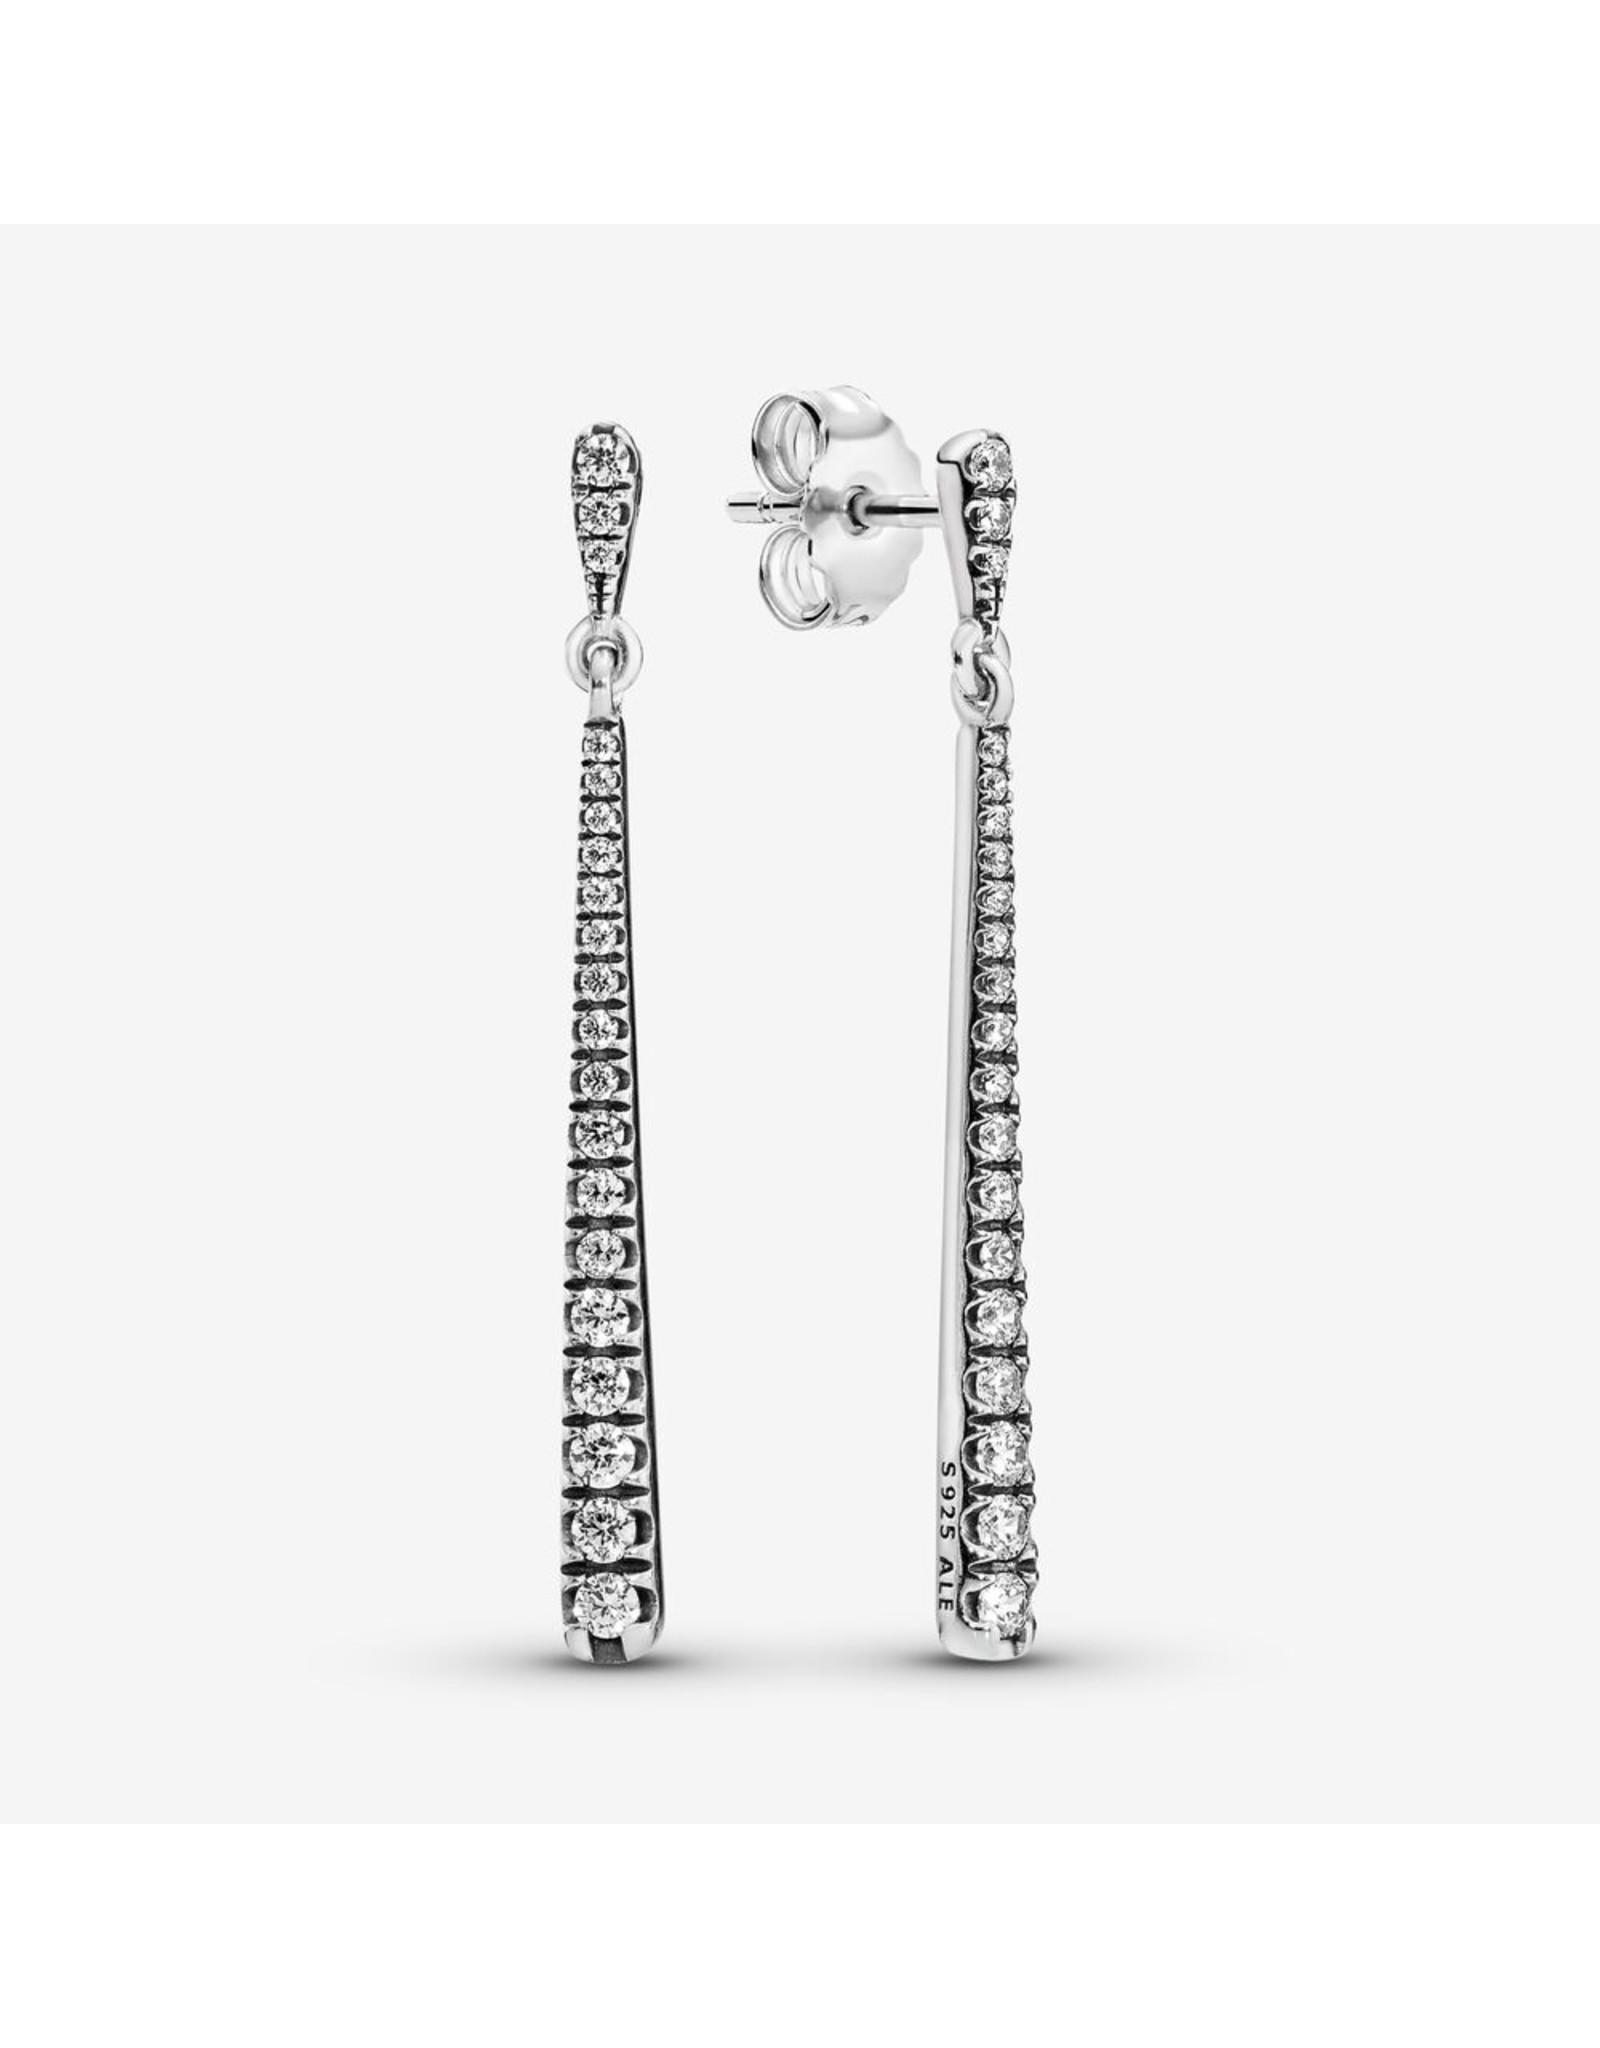 Pandora Pandora Earrings,296351CZ, Sparkling Stones Hanging